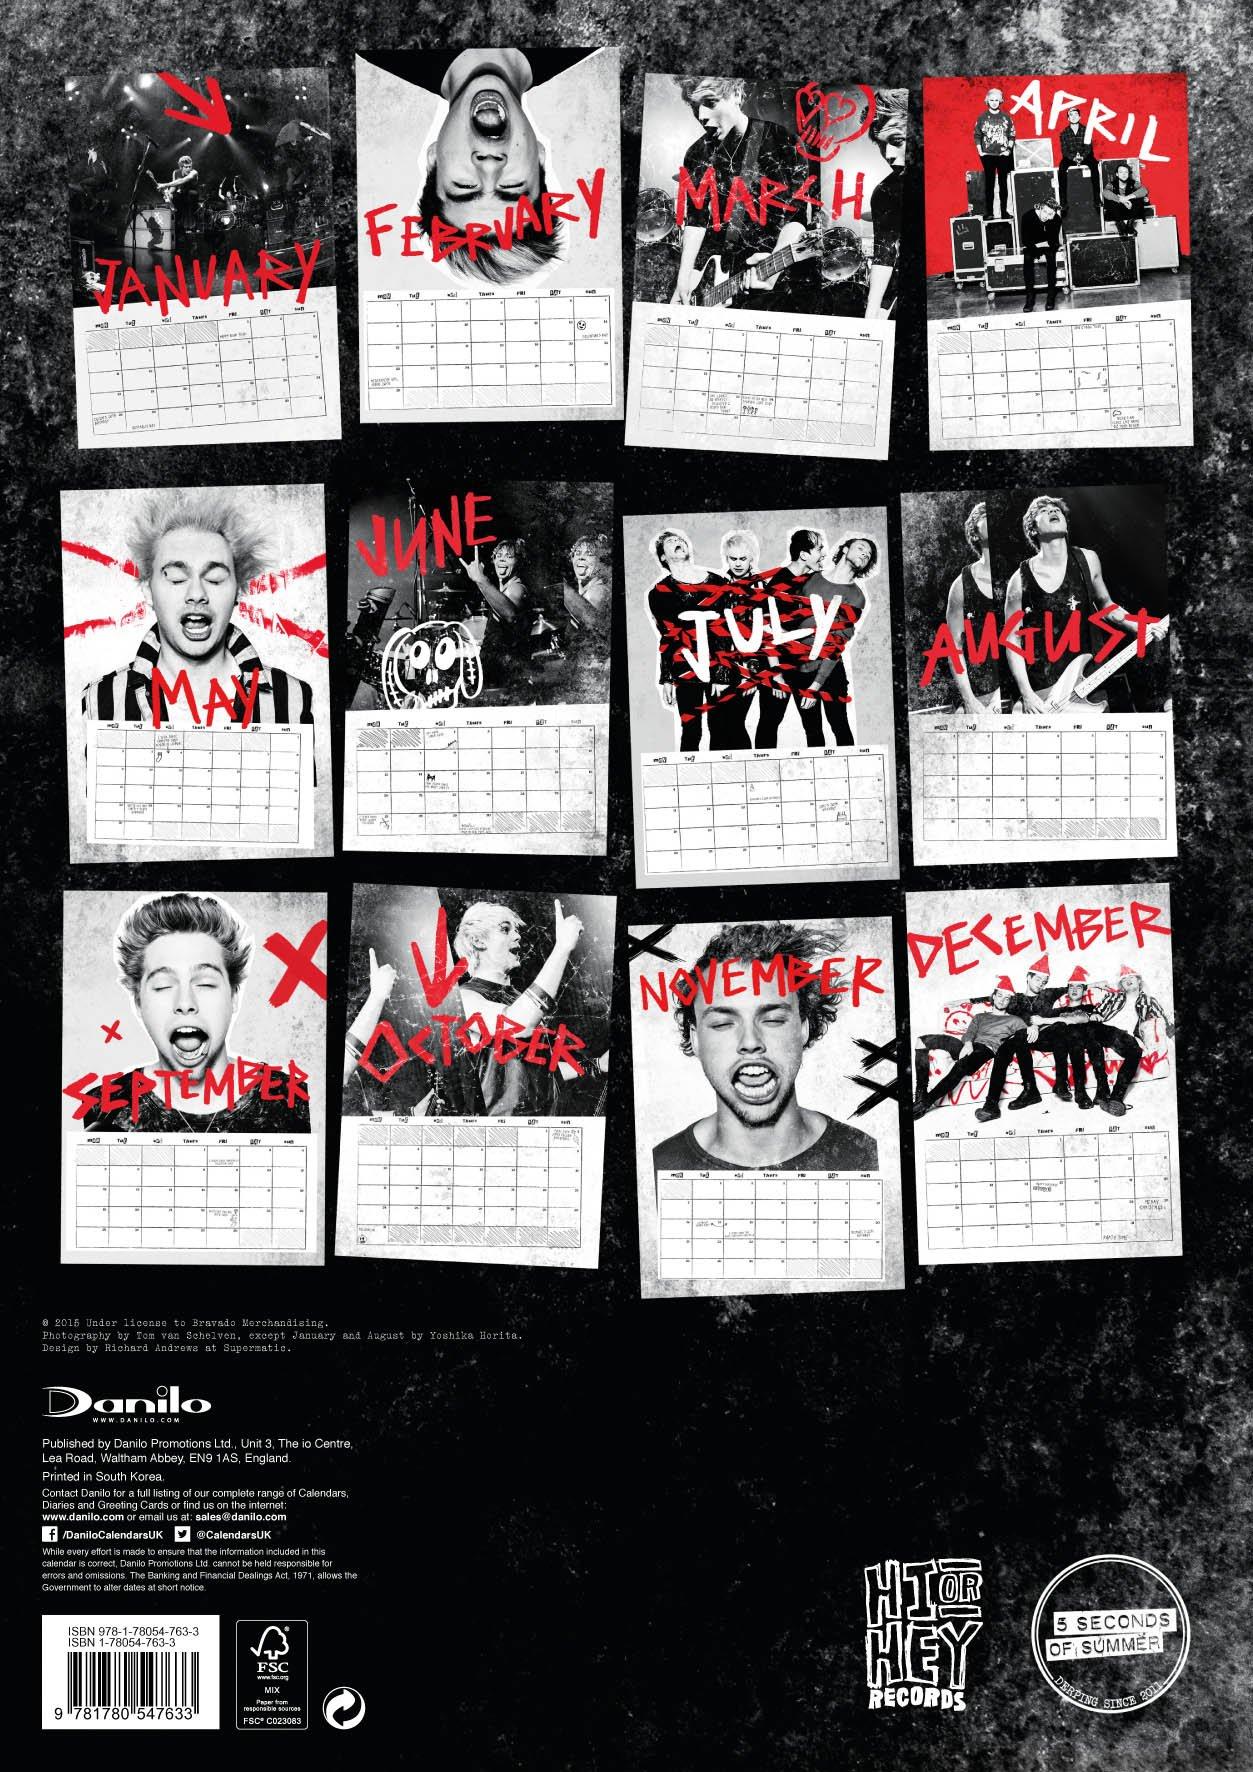 5sos poster design - The Official 5 Seconds Of Summer 2016 A3 Calendar Amazon Co Uk Danilo 9781780547633 Books